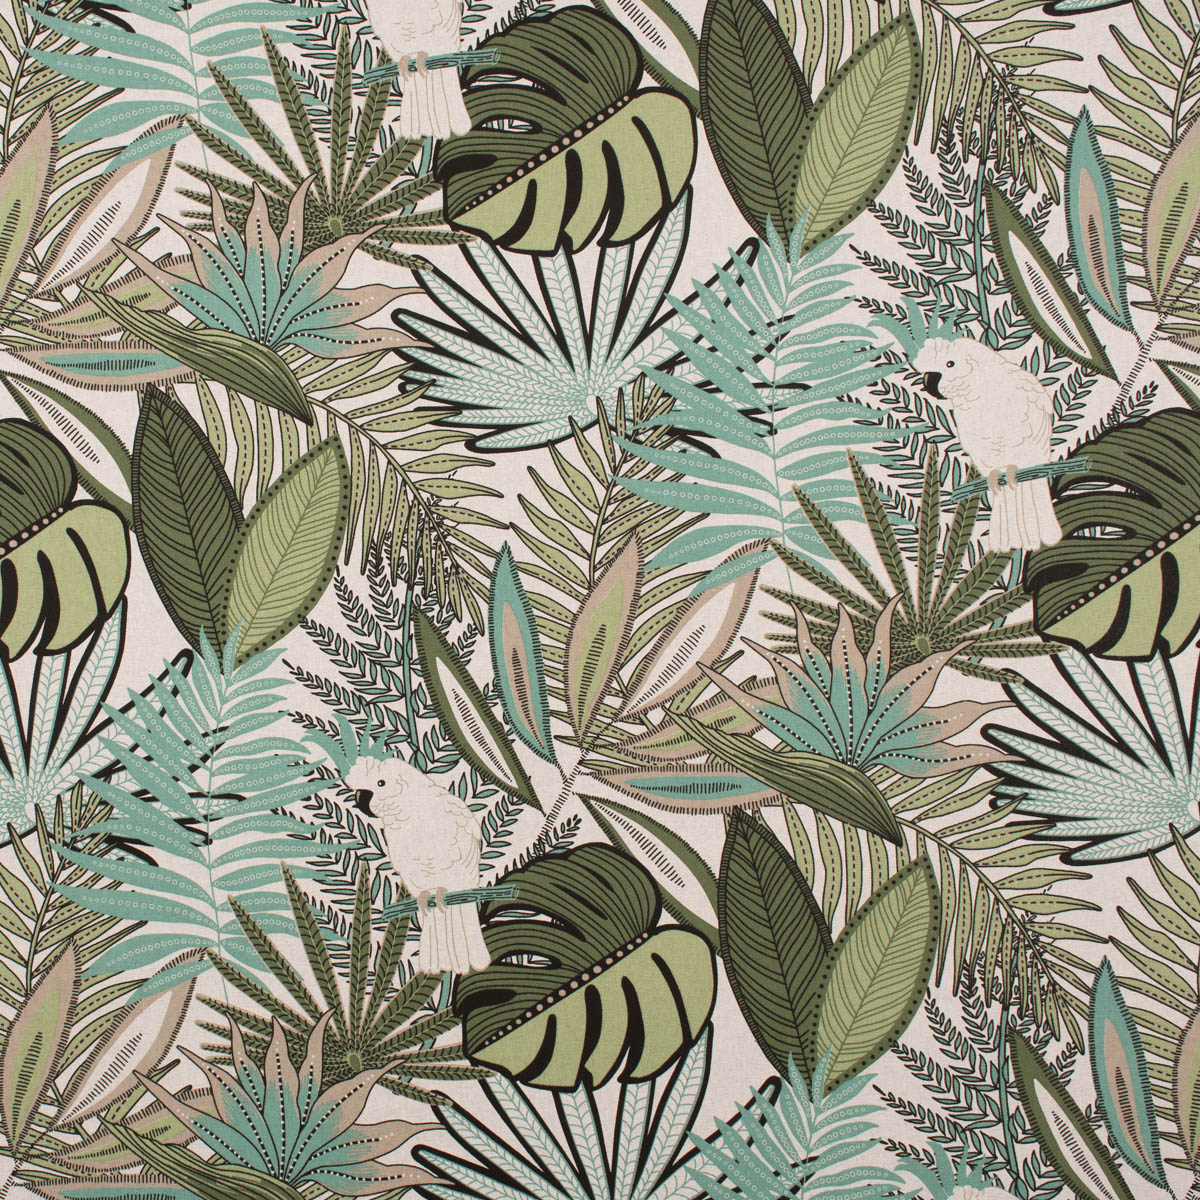 Dekostoff Halb-Panama Cacatoes Farne Blätter Kakadu natur grün155cm Breite